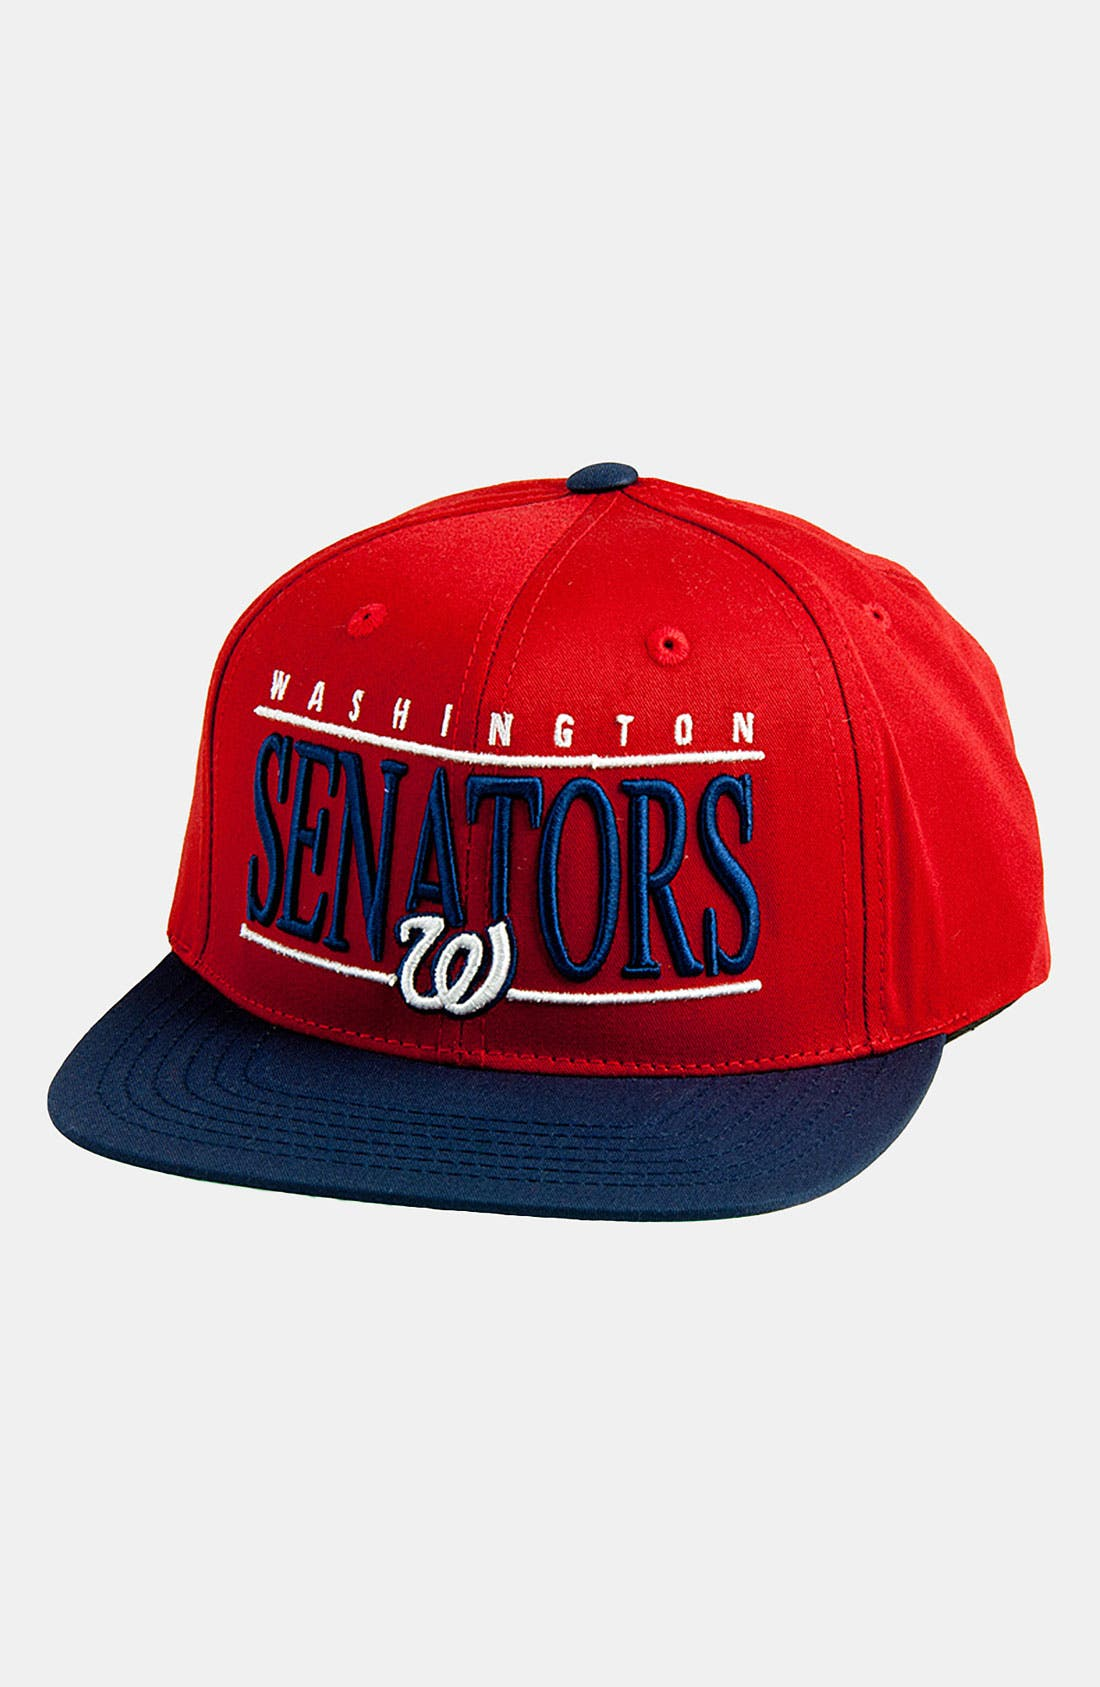 Alternate Image 1 Selected - American Needle 'Washington Senators - Nineties' Twill Snapback Baseball Cap